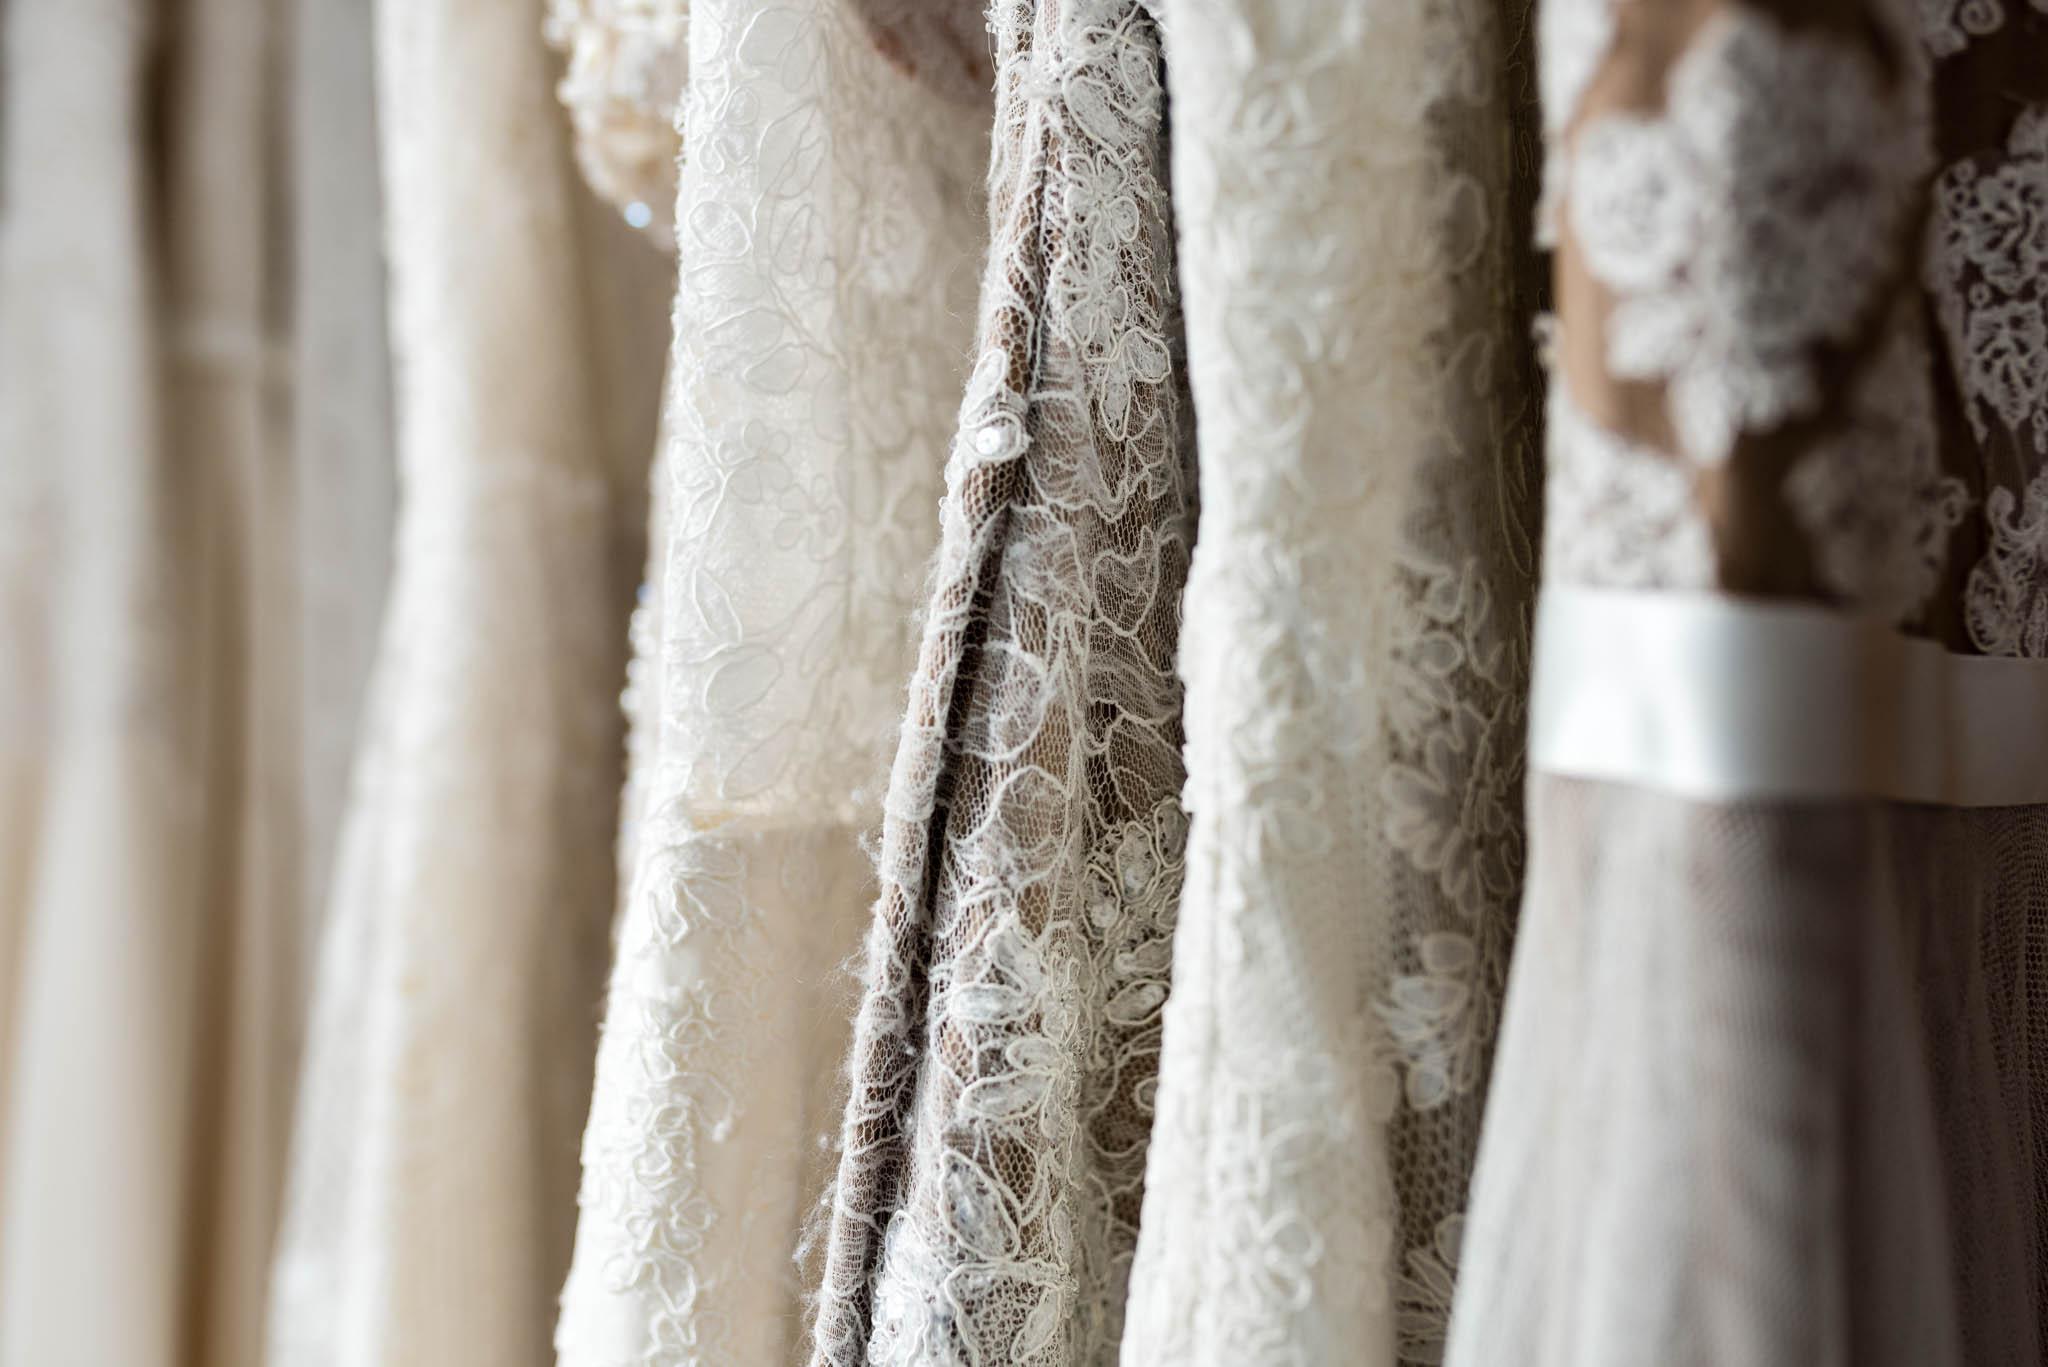 Bride by jennifer maughan staff